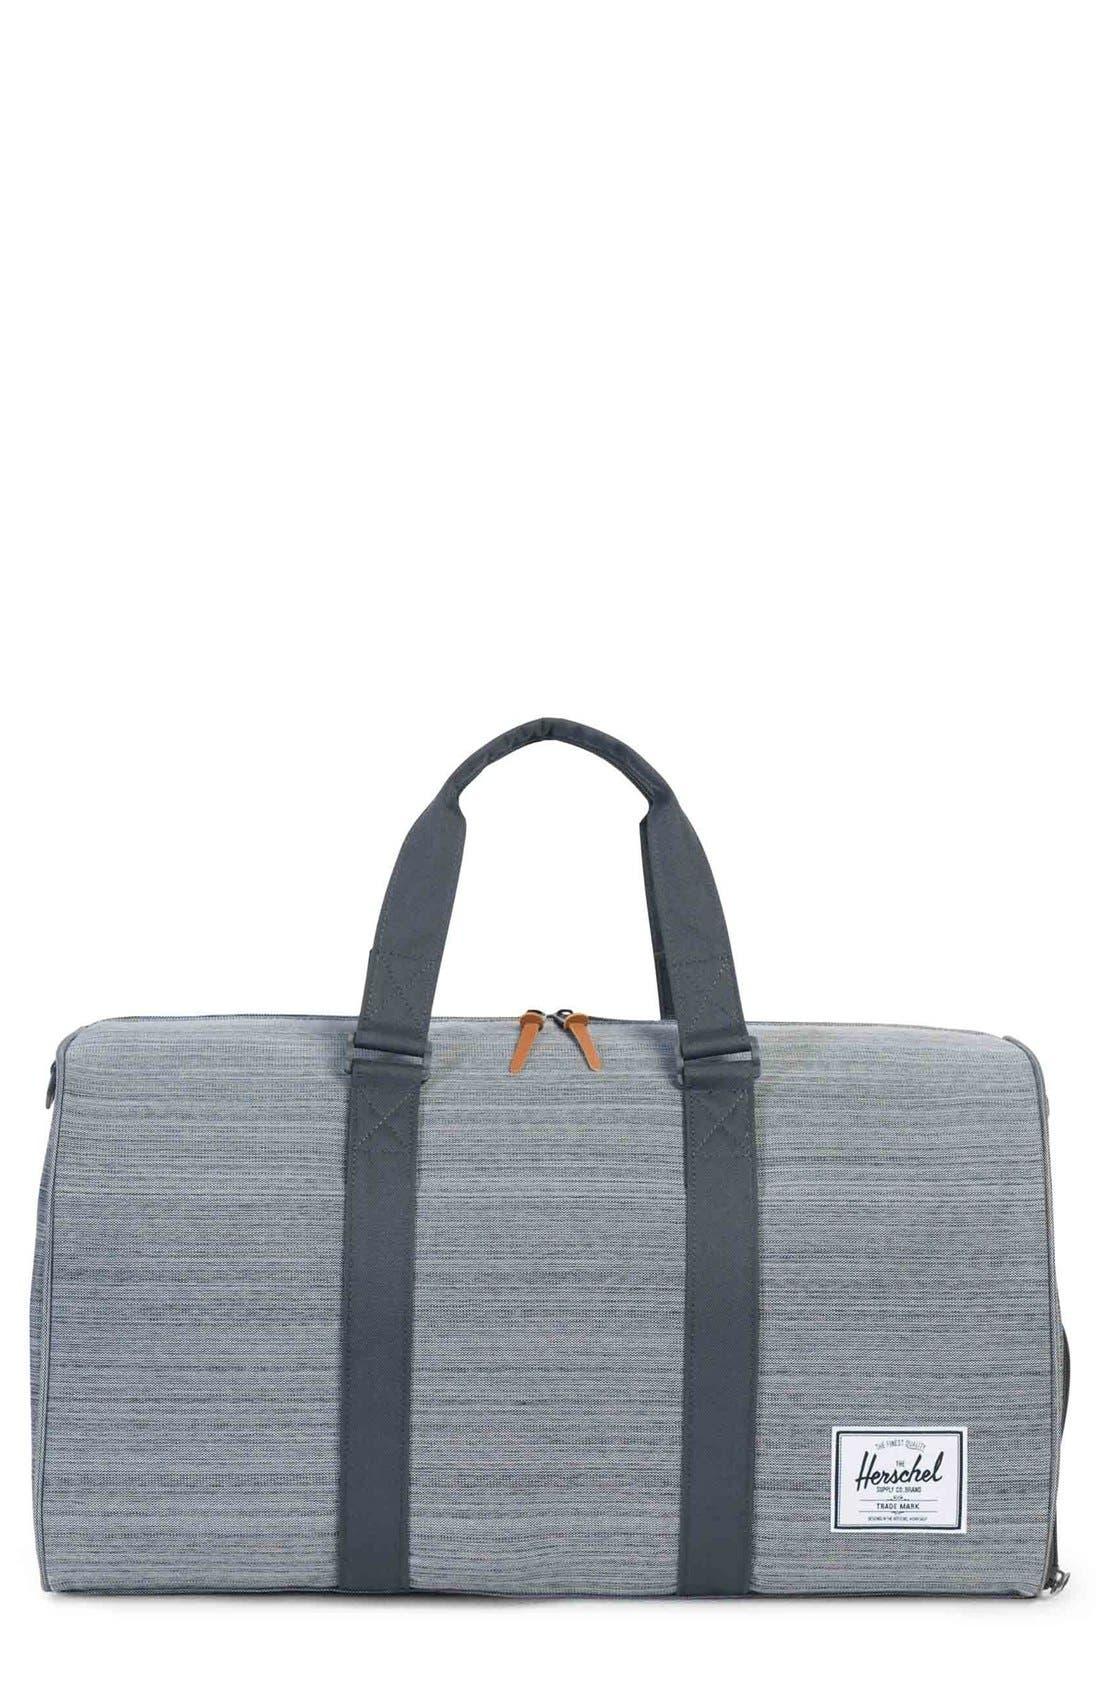 Novel Duffel Bag,                         Main,                         color, Multi Crosshatch/ Dark Shadow